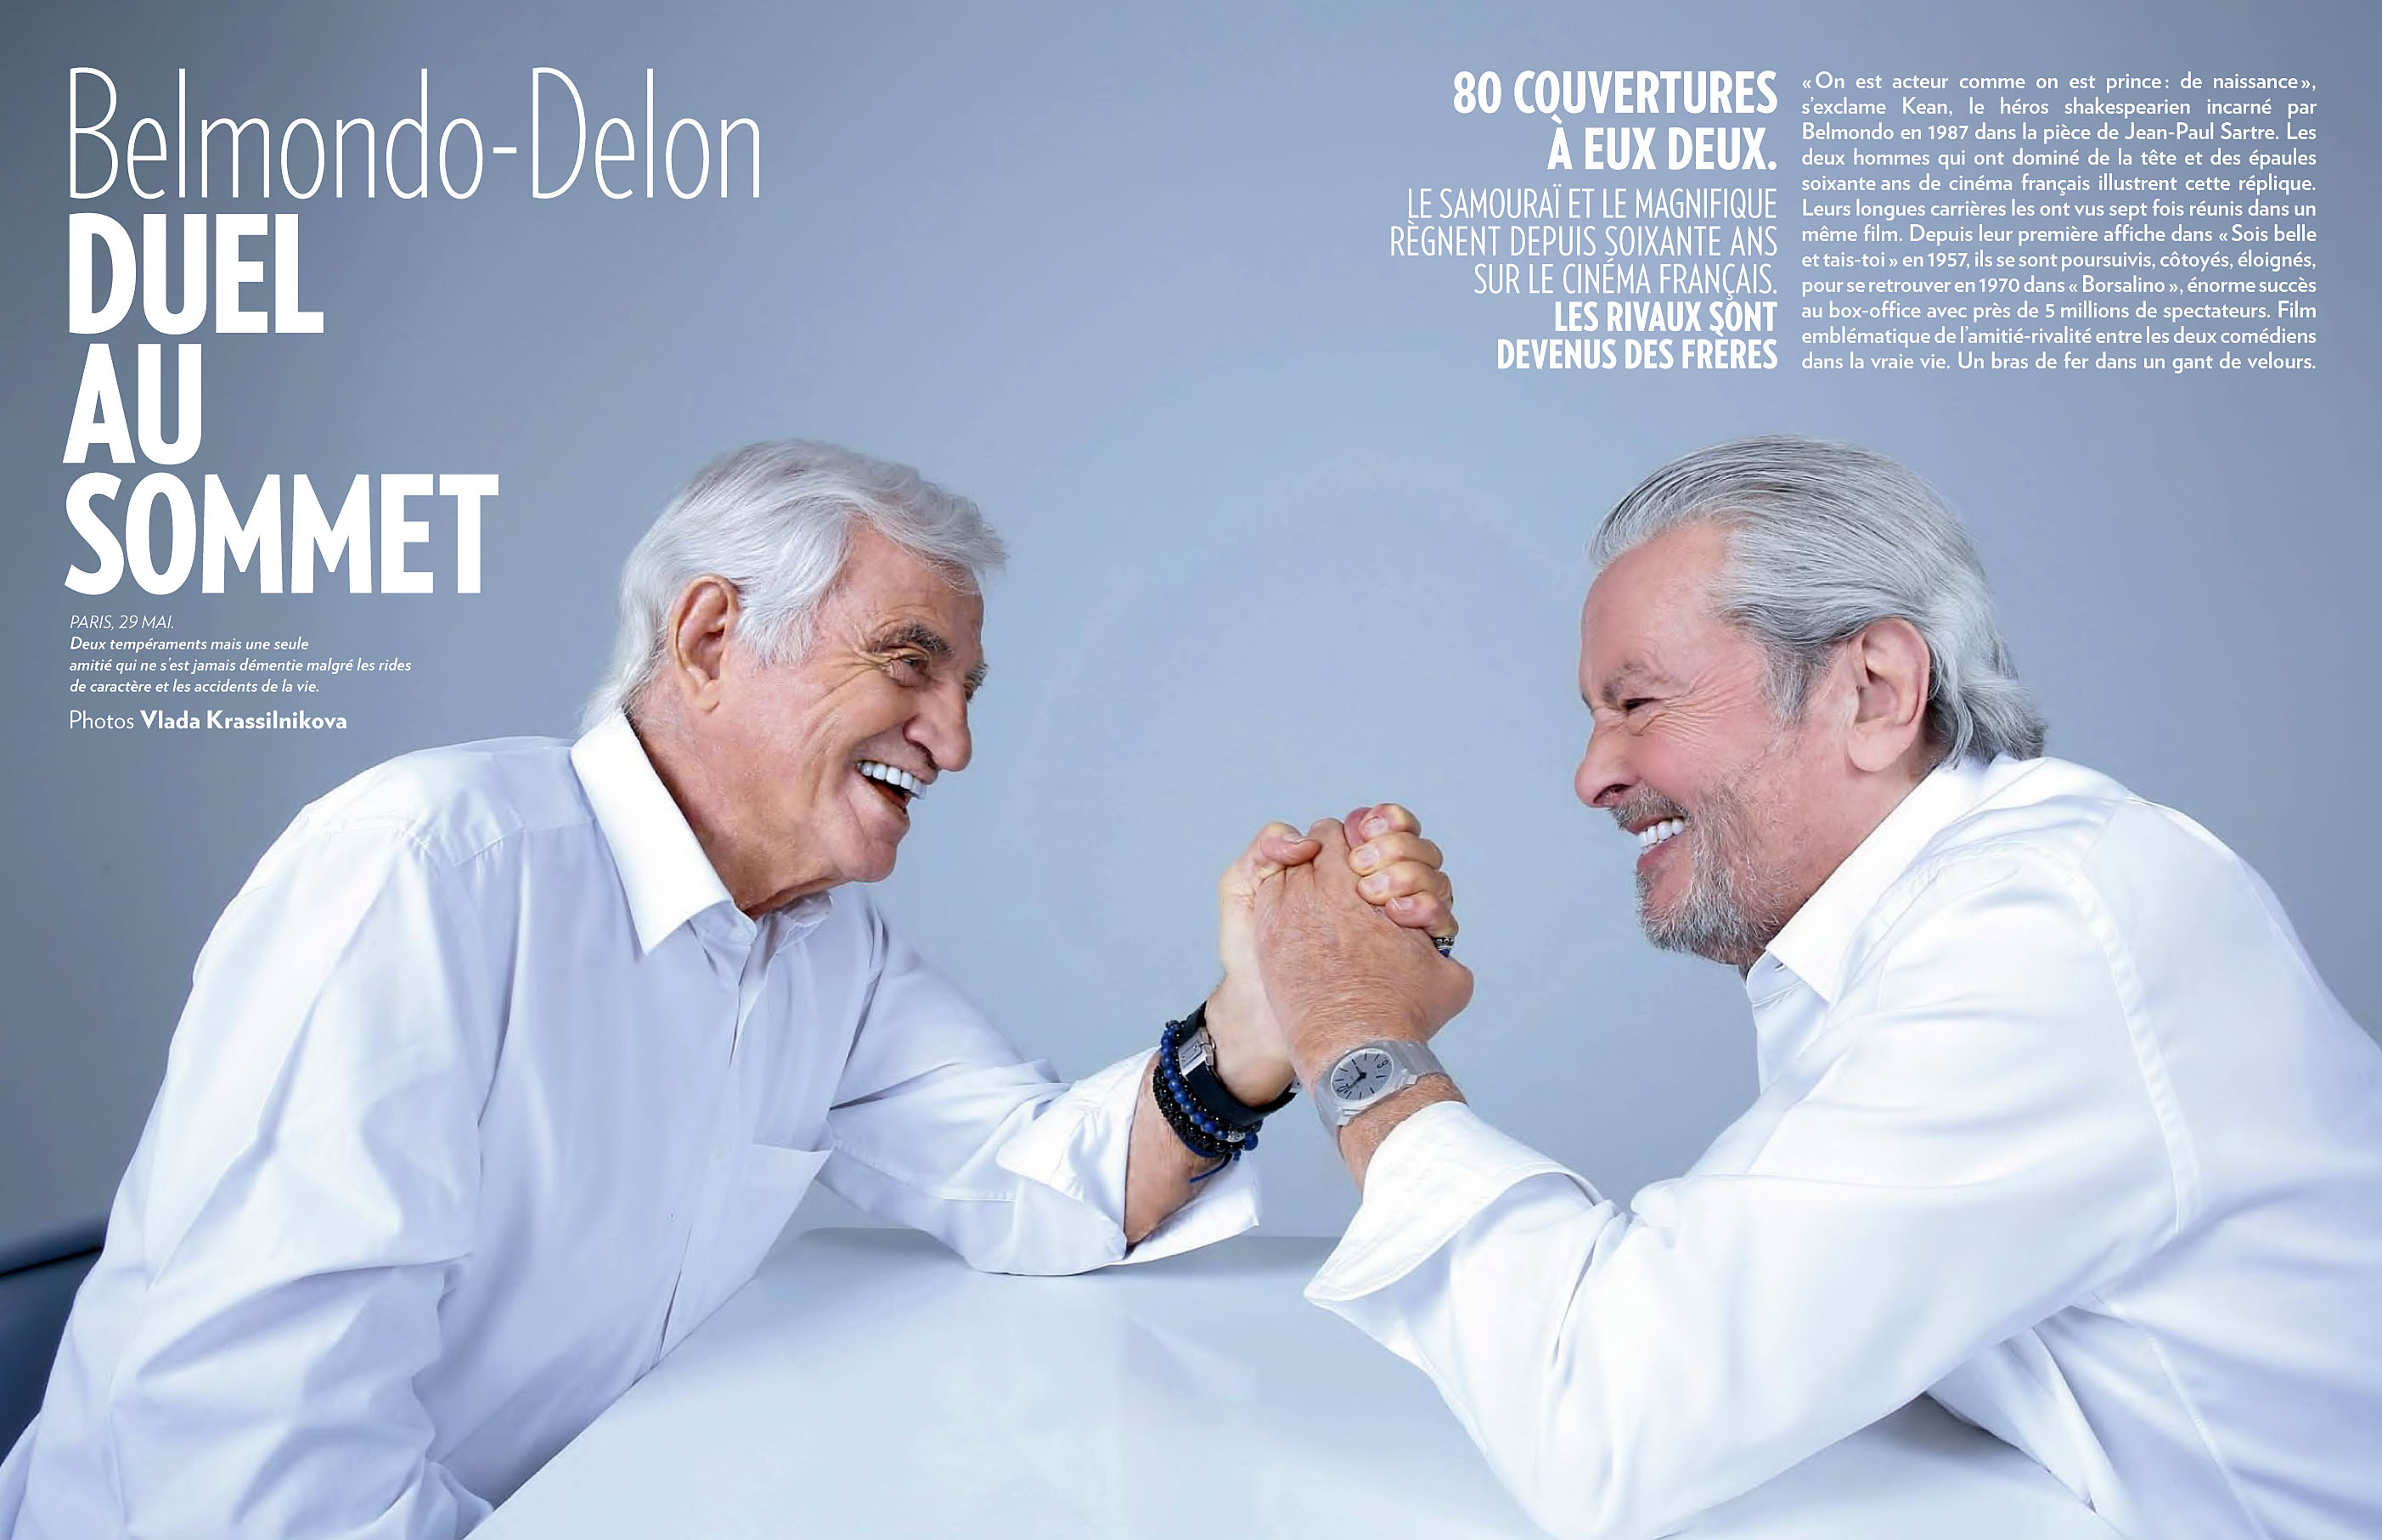 Paris Match 3657 190612 Delon 01.jpg